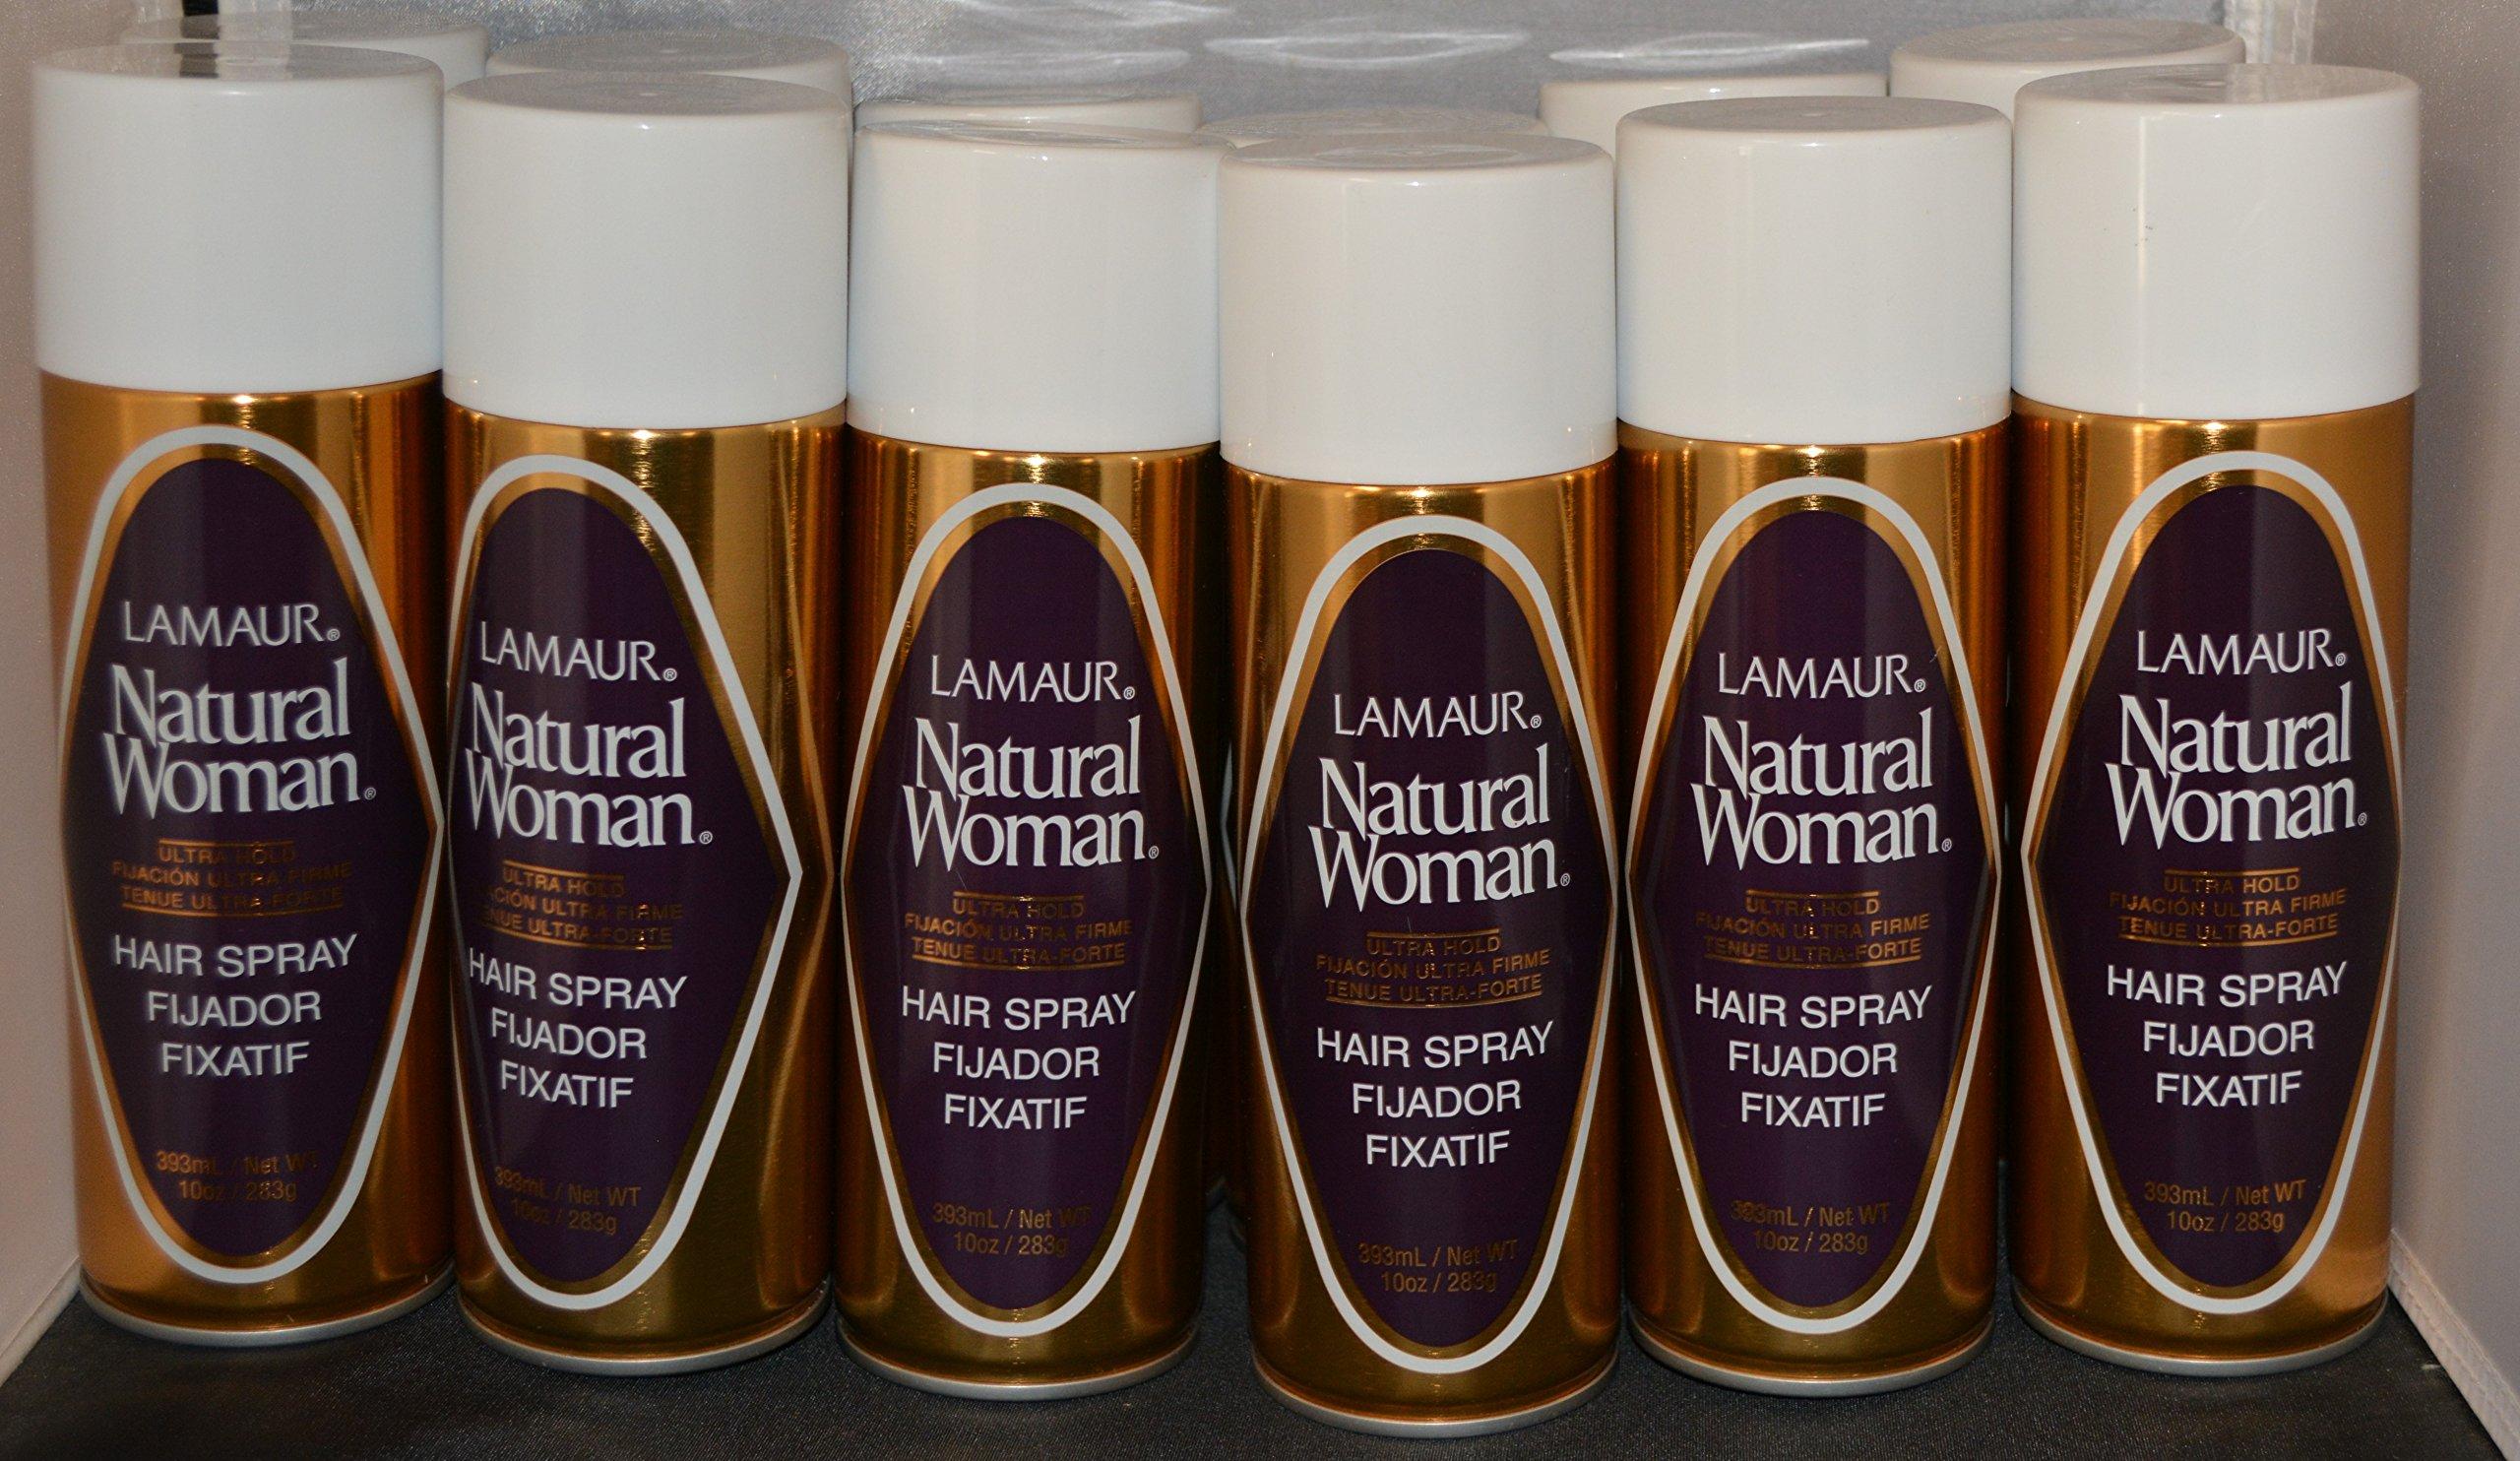 Lamaur Natural Woman Ultra Hold Professional Hair Spray 80% Voc 10 oz (12 pack)